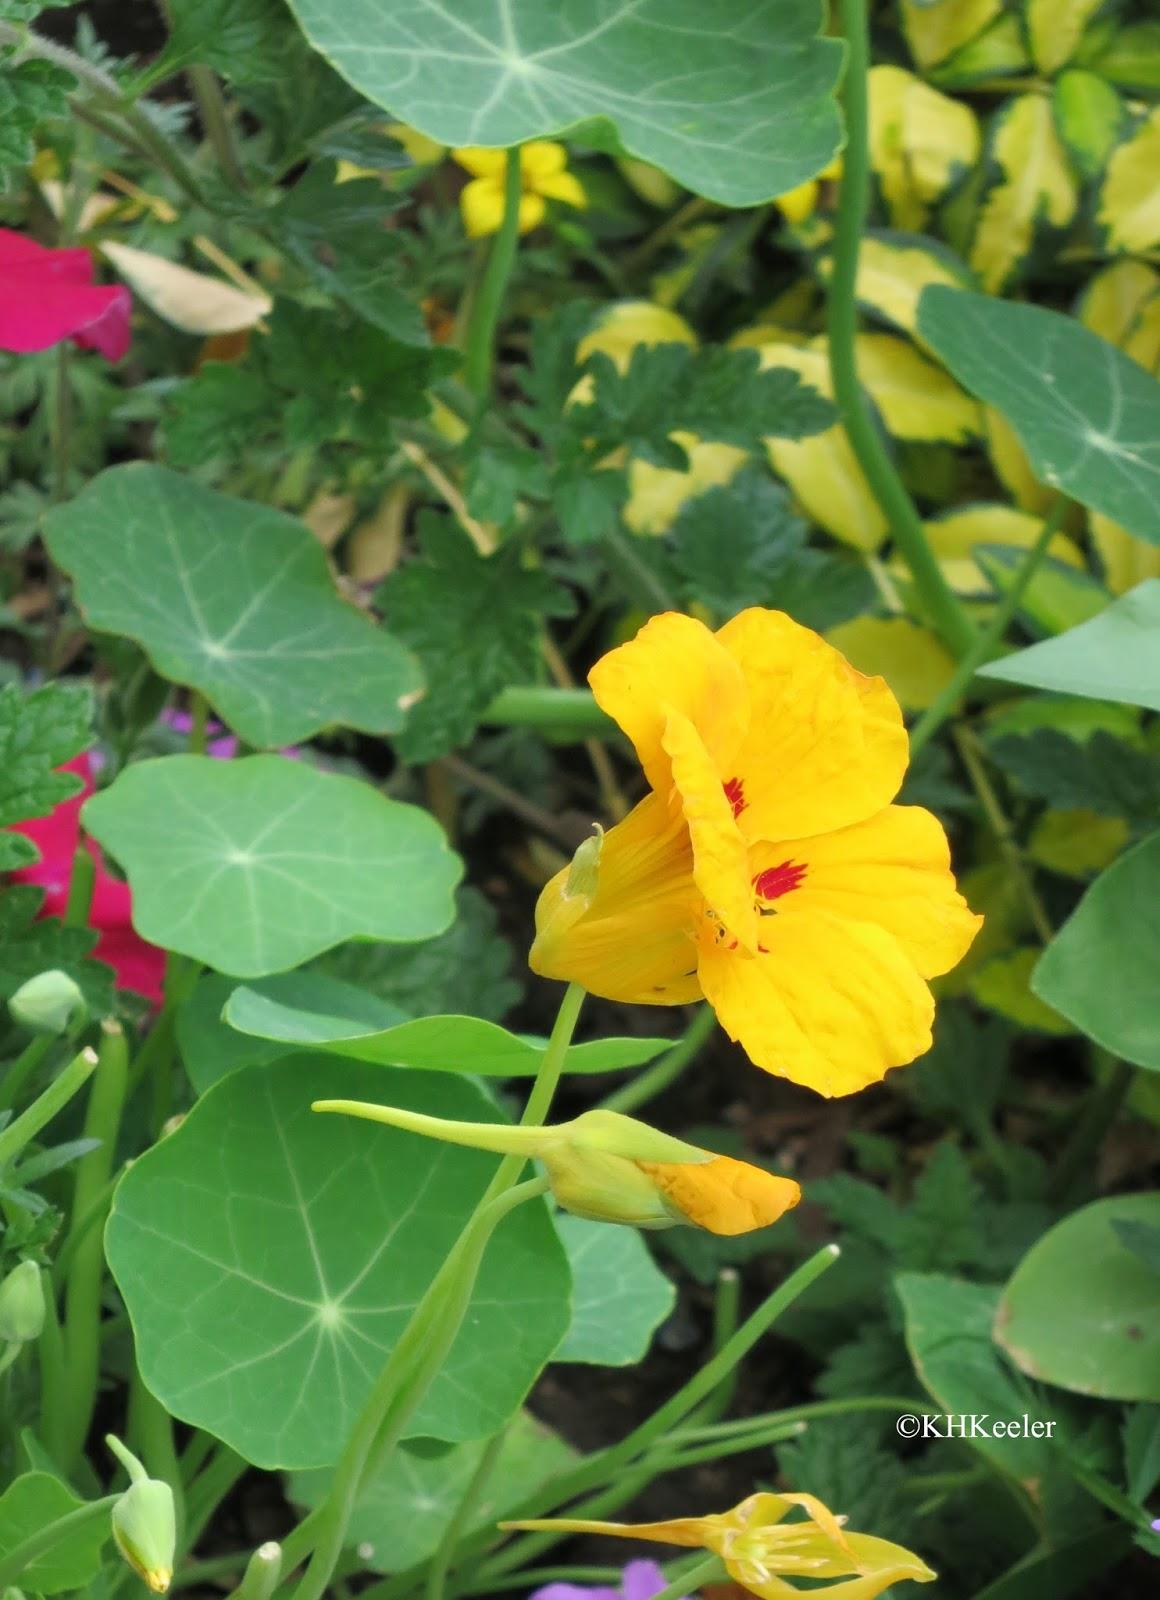 A Wandering Botanist Un Plants The Strange Case of Nasturtium and Wa